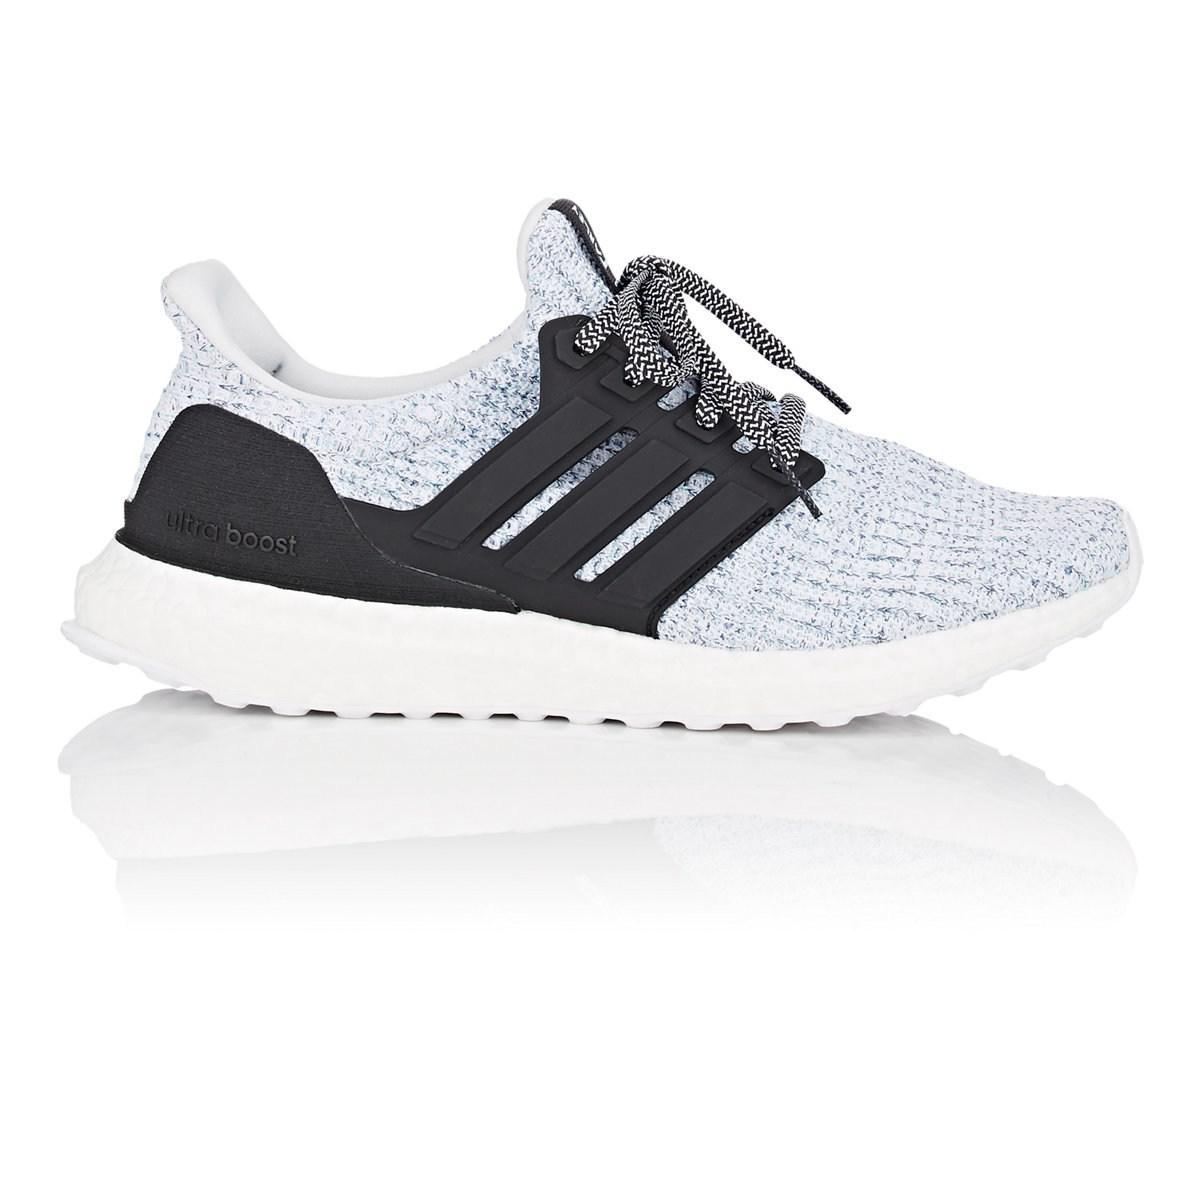 6a4ee8a93 adidas. Women s Blue Ultraboost Primeknit Sneakers.  200 From Barneys New  York